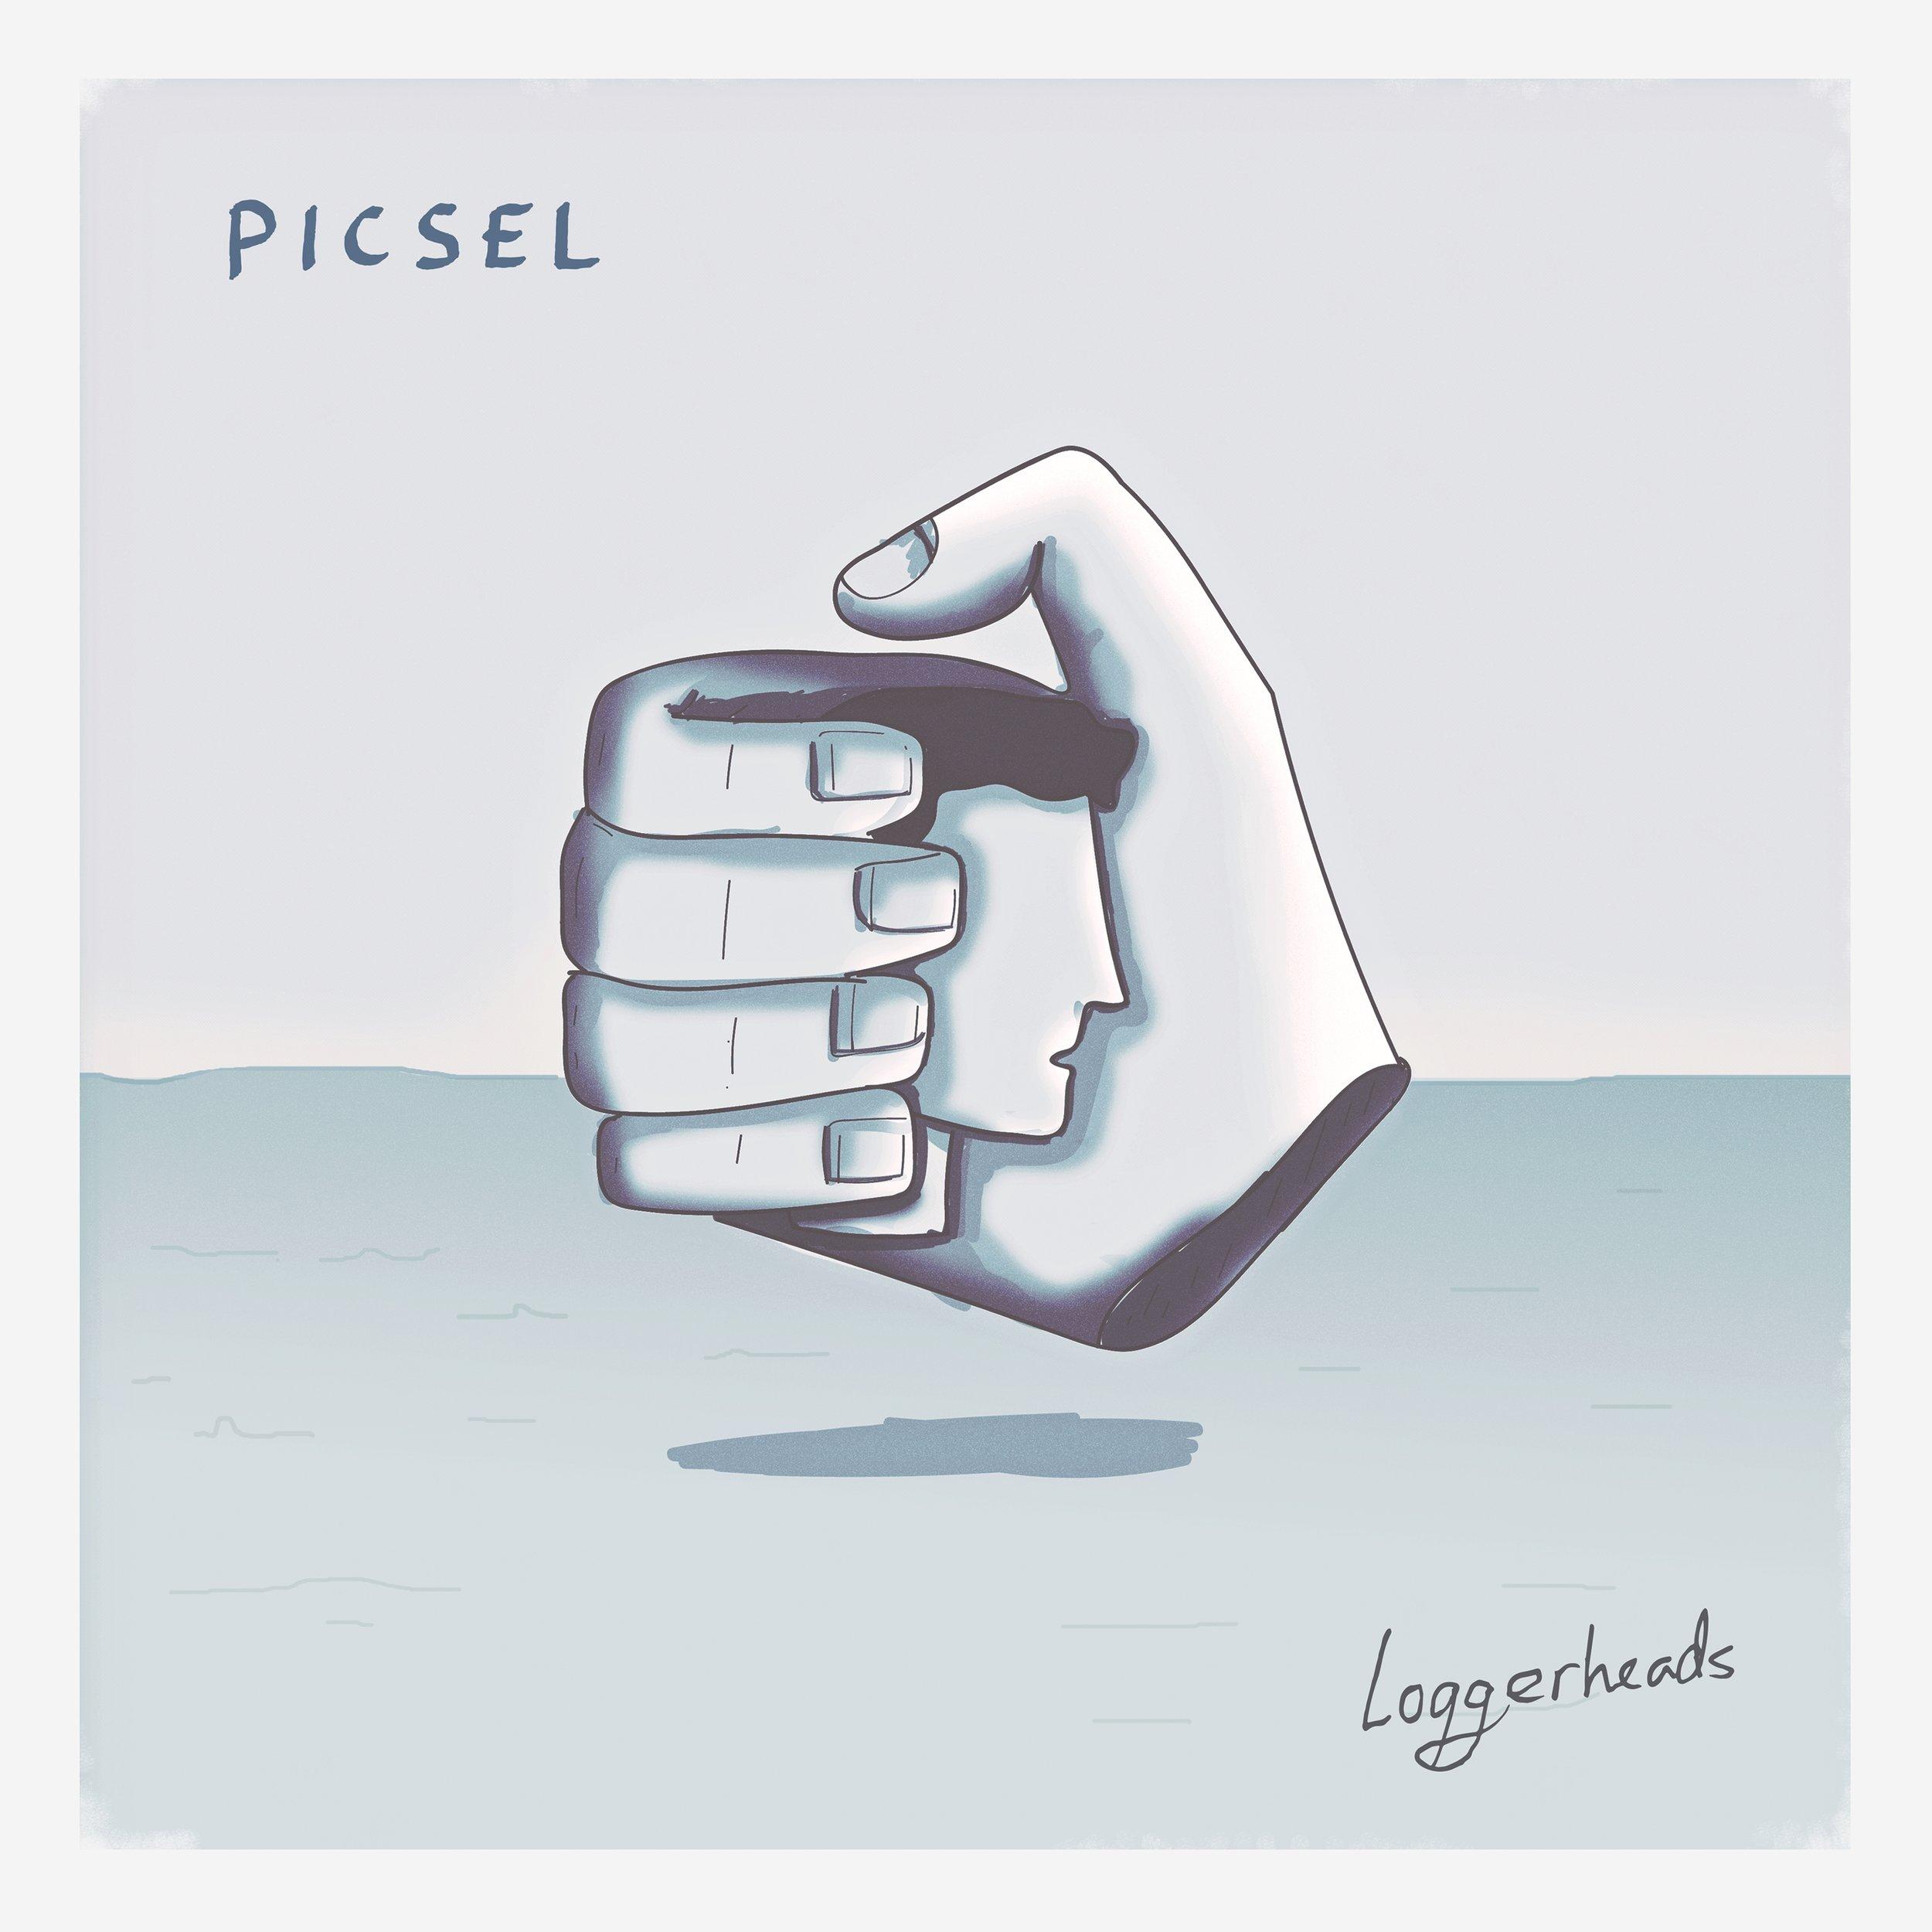 Picsel - Loggerheads